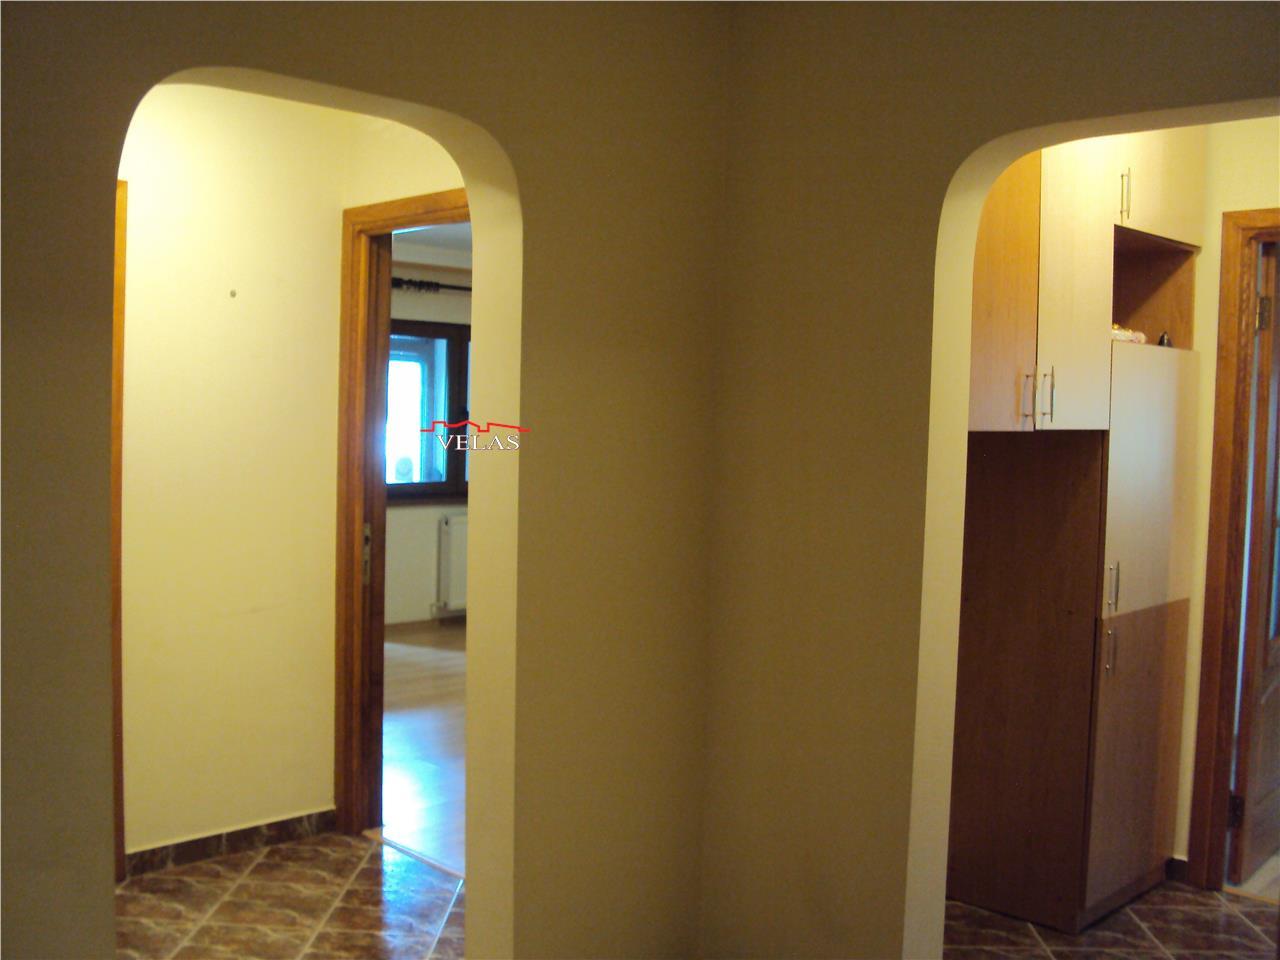 Apartament 4 camere, parter, doua balcoane, CT, s.u.110 mp, alarma